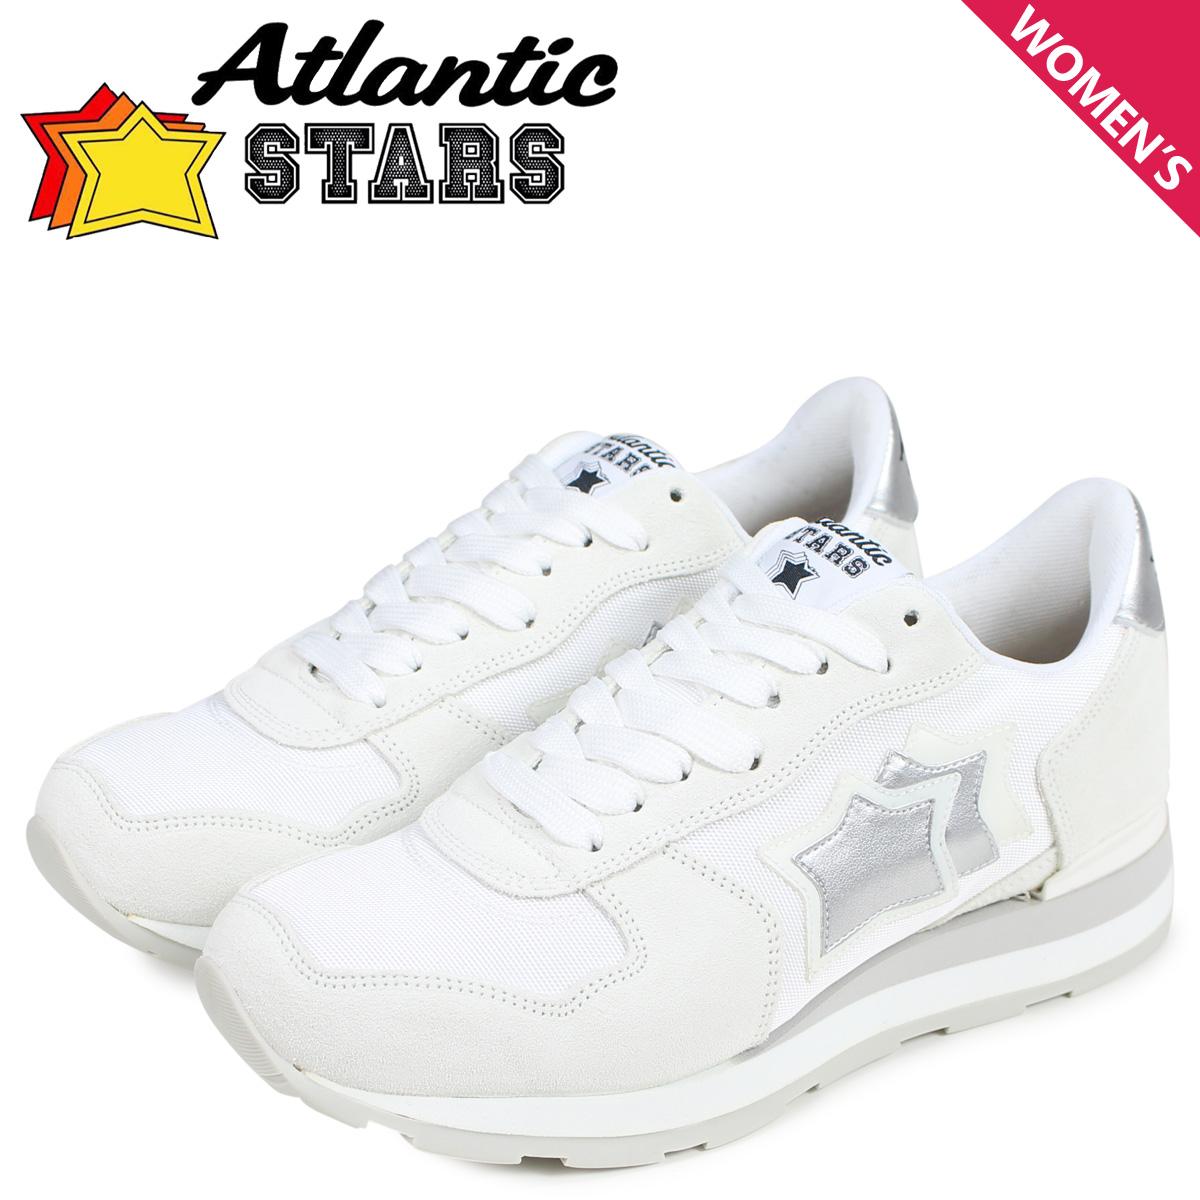 Atlantic STARS アトランティックスターズ ベガ スニーカー レディース VEGA ホワイト 白 BA-86B [予約商品 4/5頃入荷予定 新入荷]